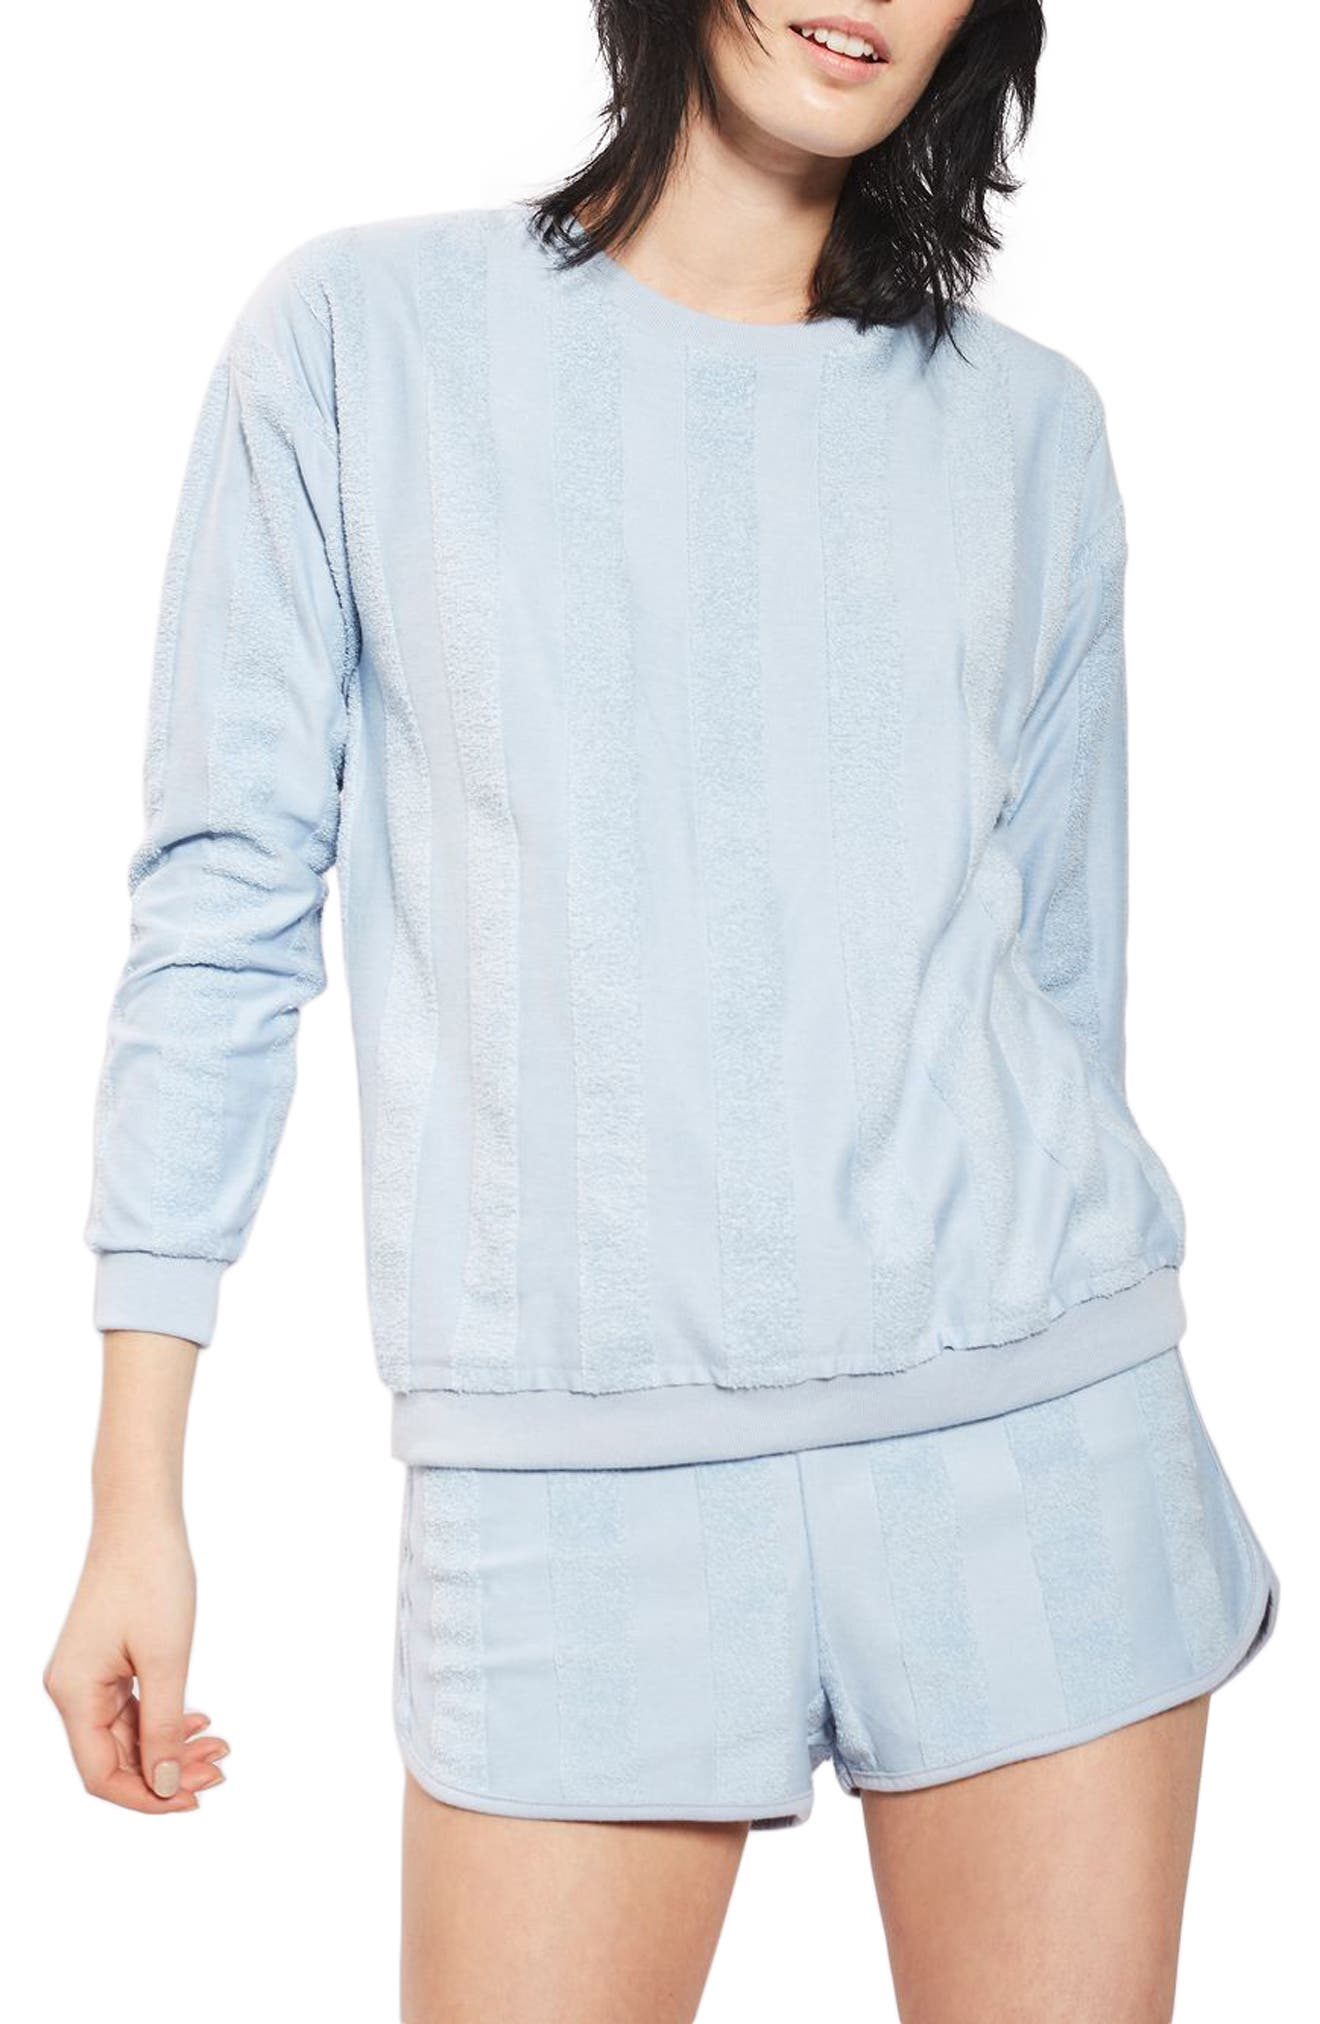 Alternate Image 1 Selected - Topshop Towel Stripe Lounge Sweatshirt